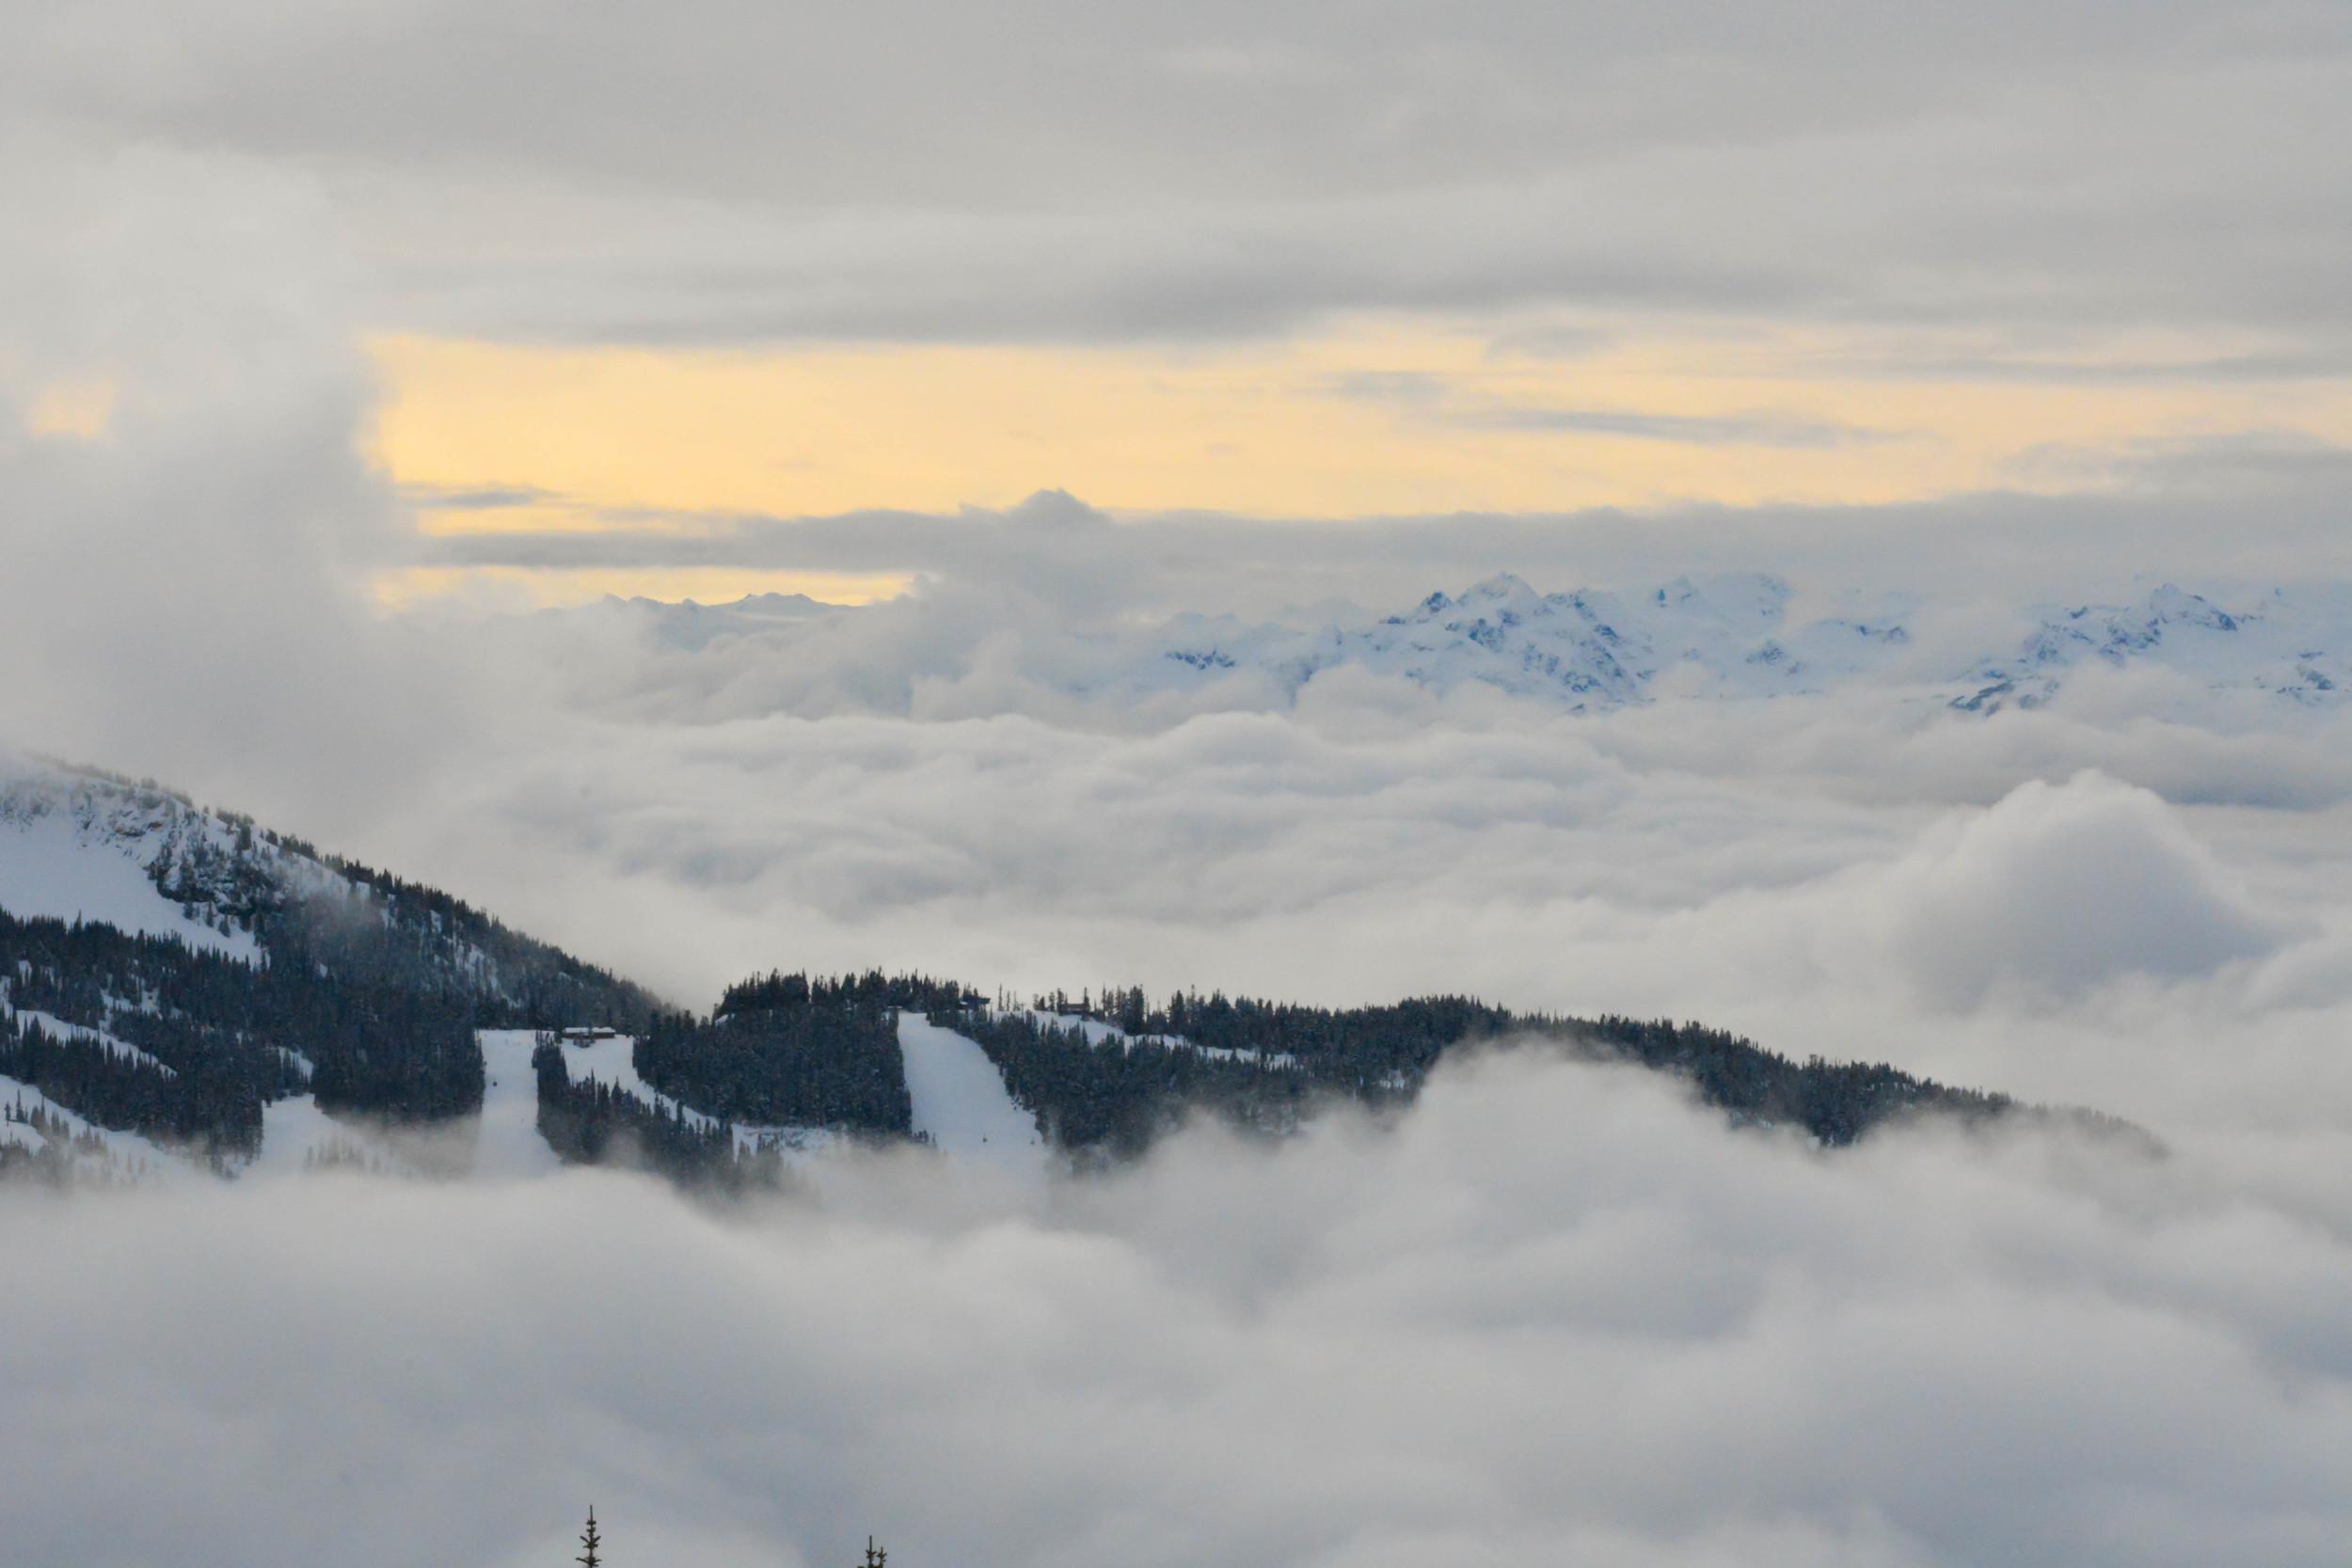 Cloud Filled Valleys